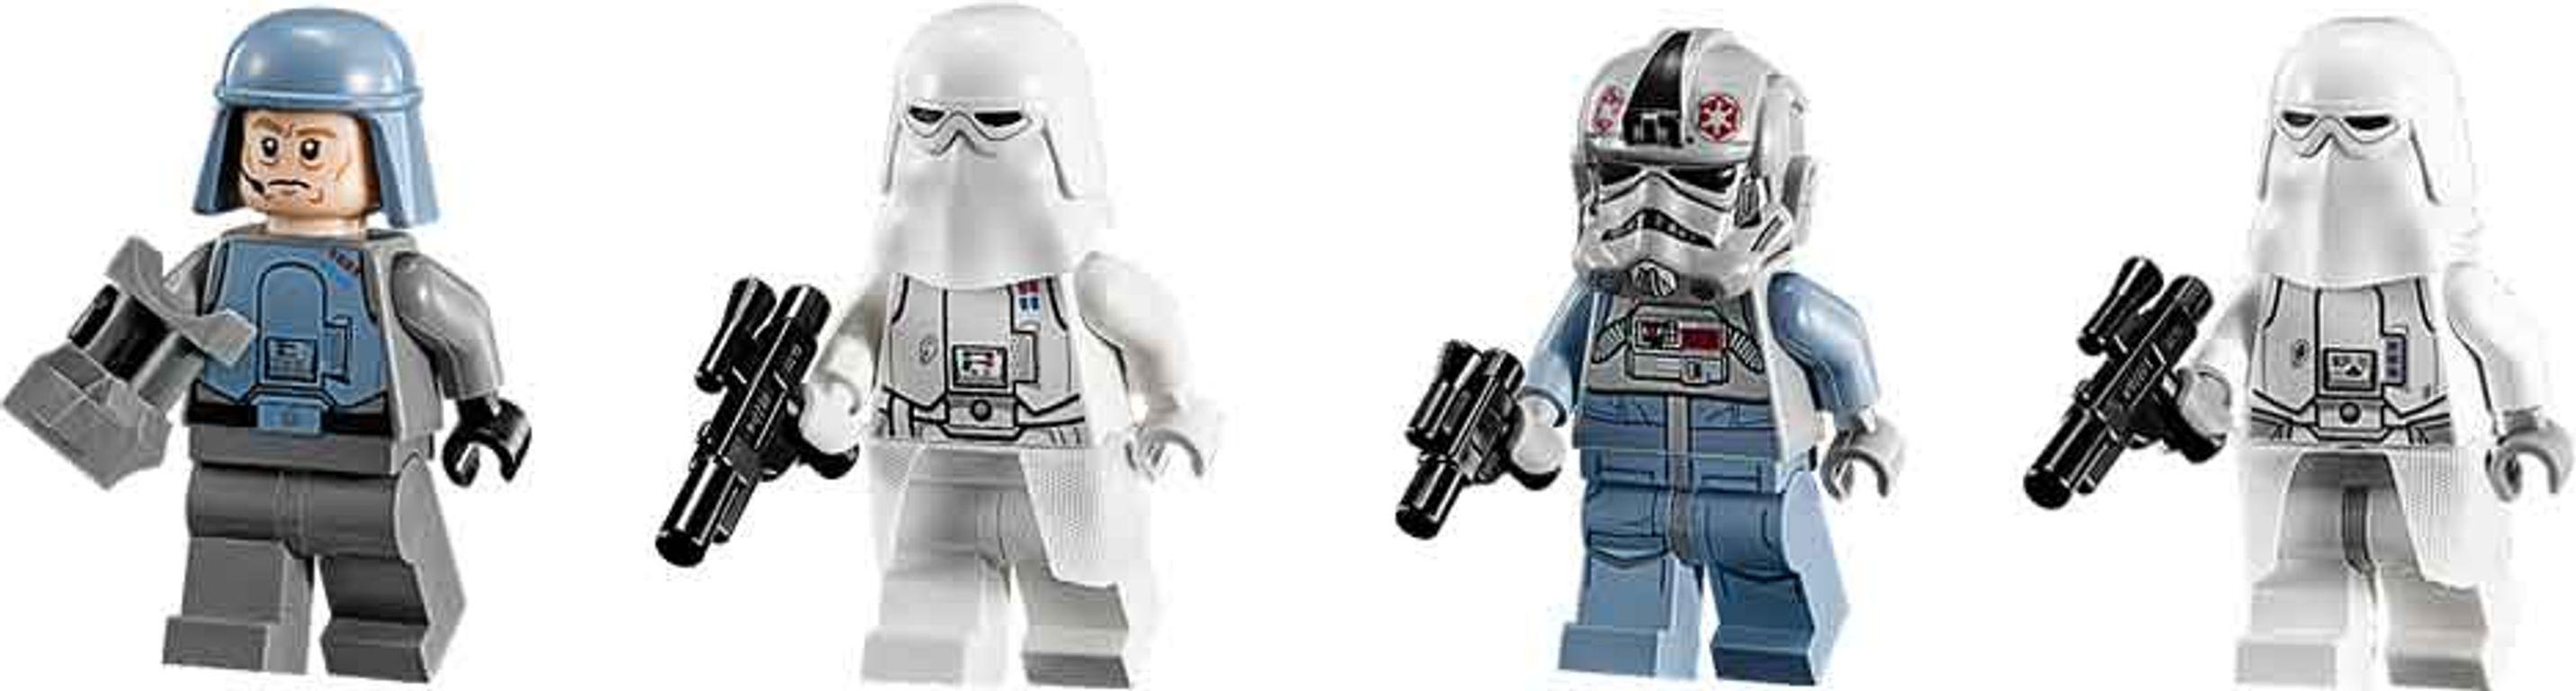 LEGO® Star Wars AT-AT minifigures